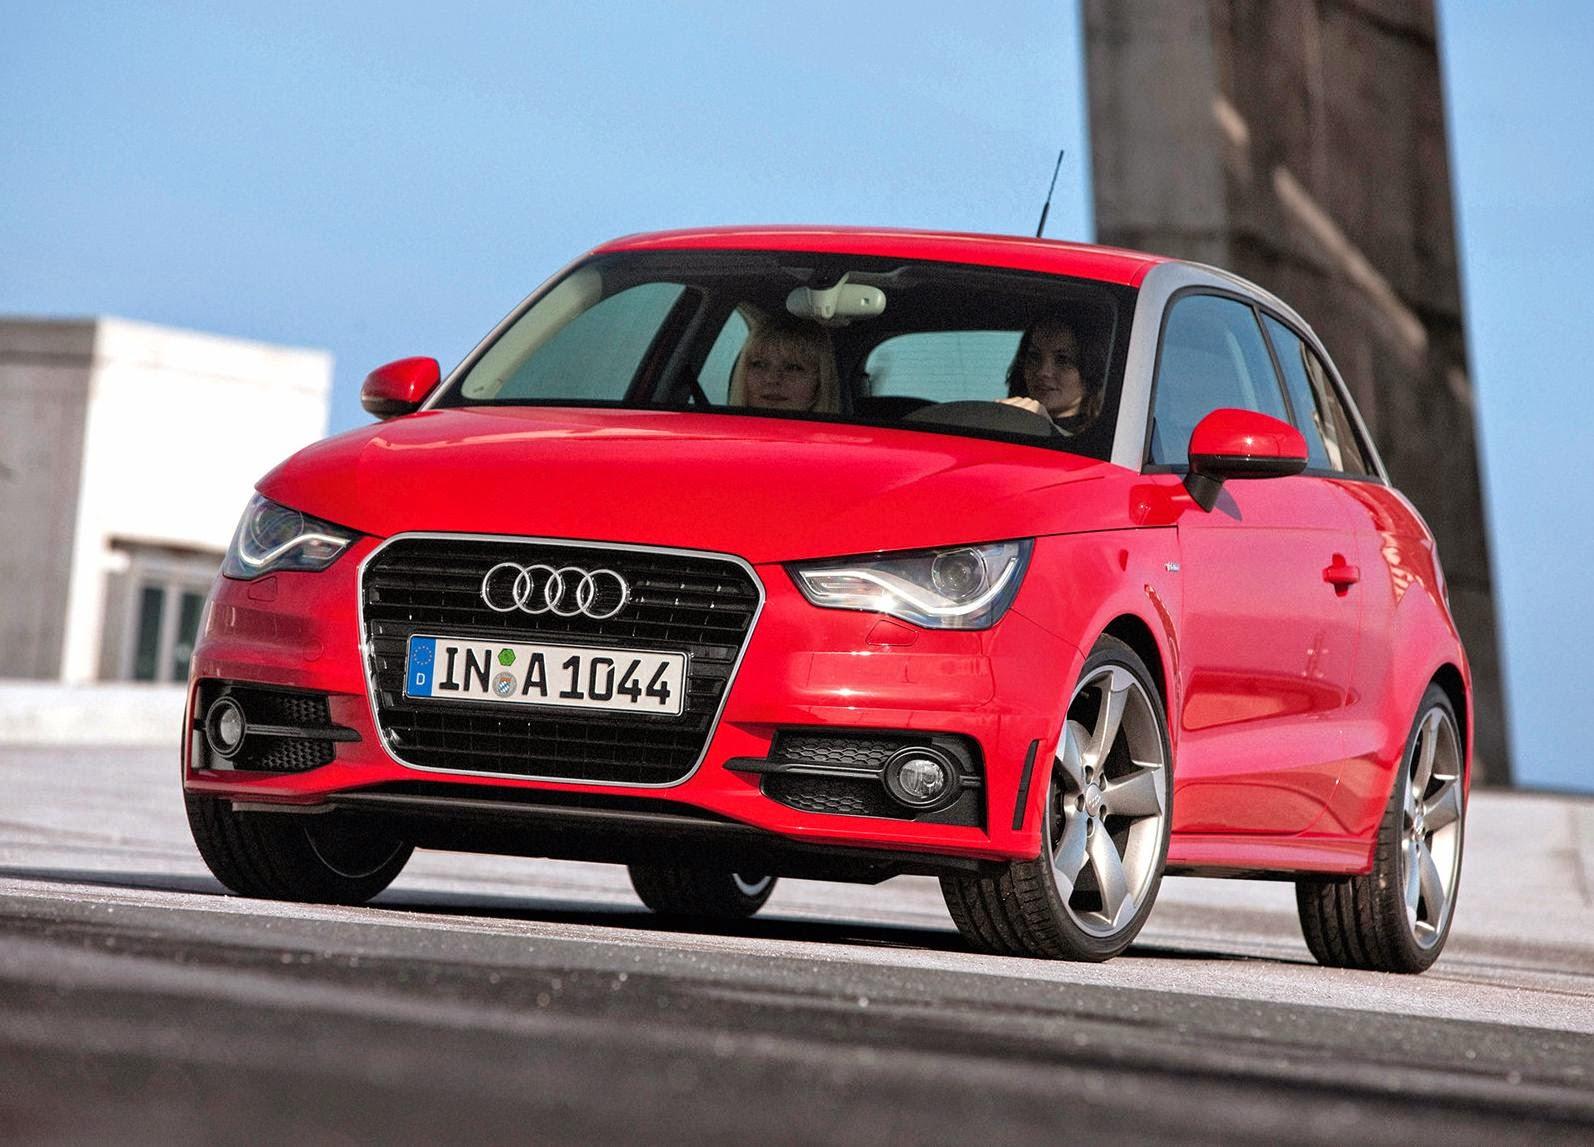 Audi A1 2011 1080p Wallpaper